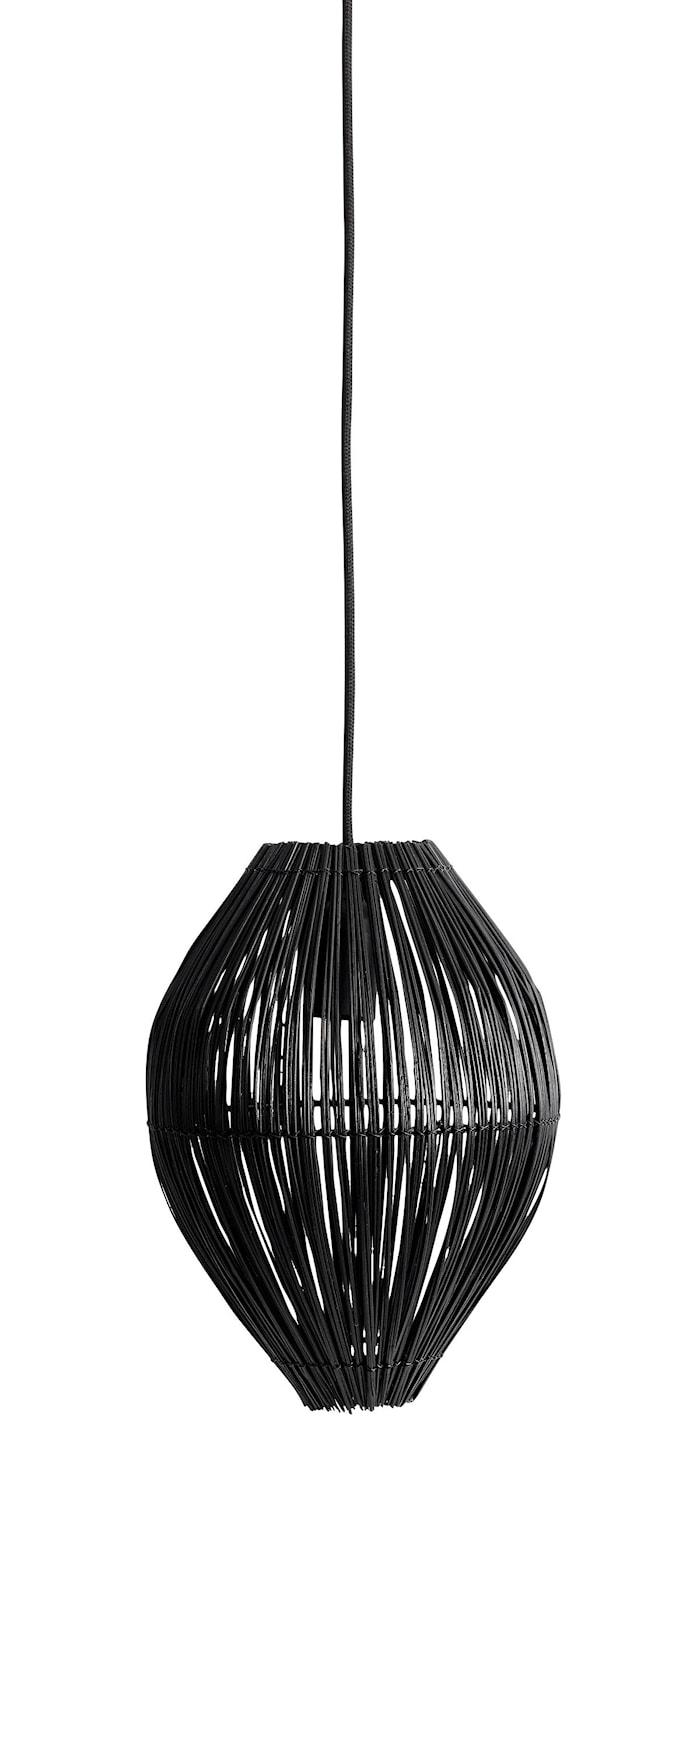 Fishtrap Bambu S Taglampe 29,5x23 cm - Sort